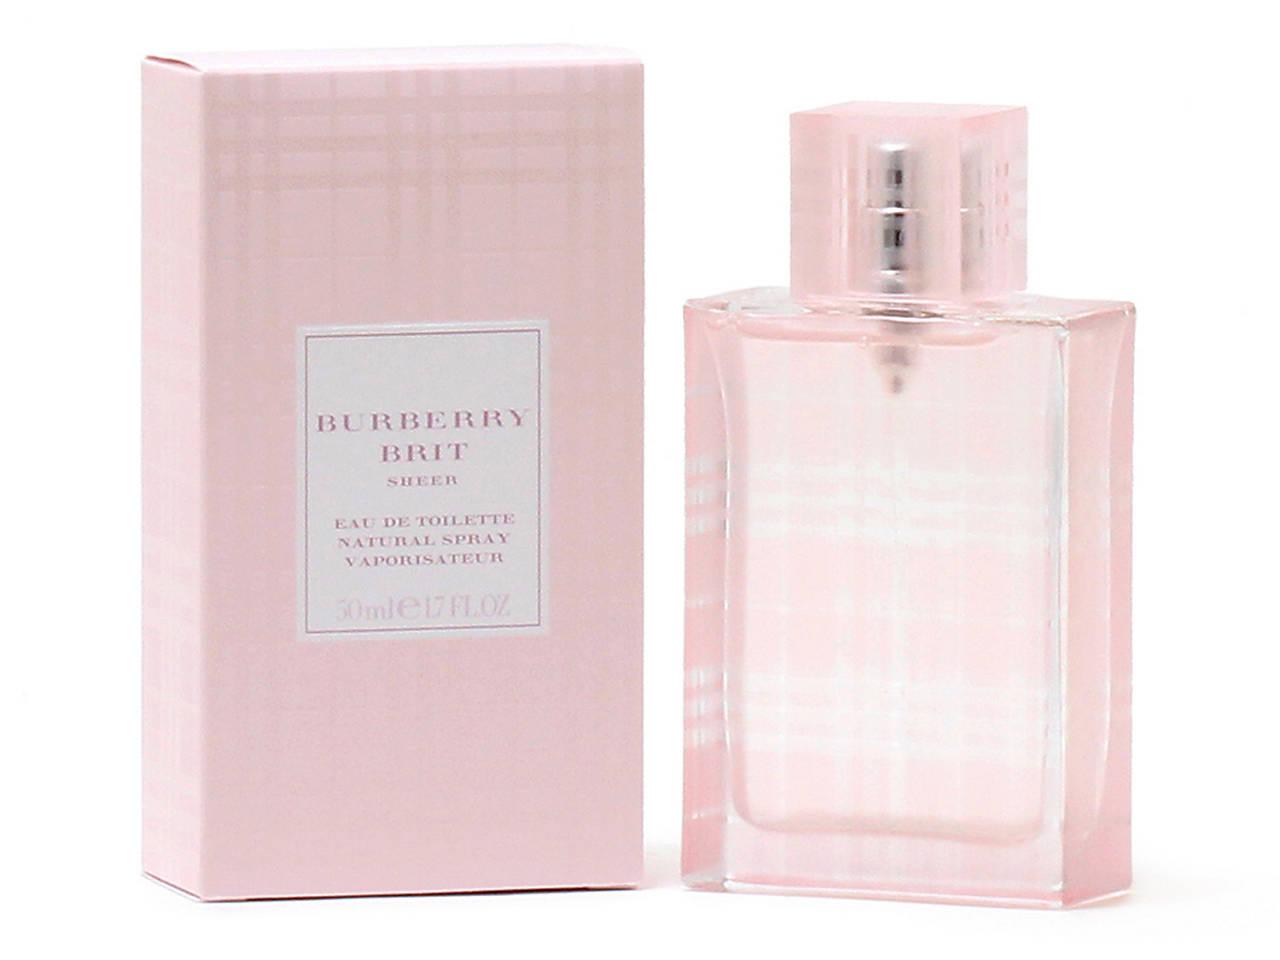 b9fb12fc08 Burberry - Fragrance Brit Sheer Eau De Toilette Spray - Women's ...